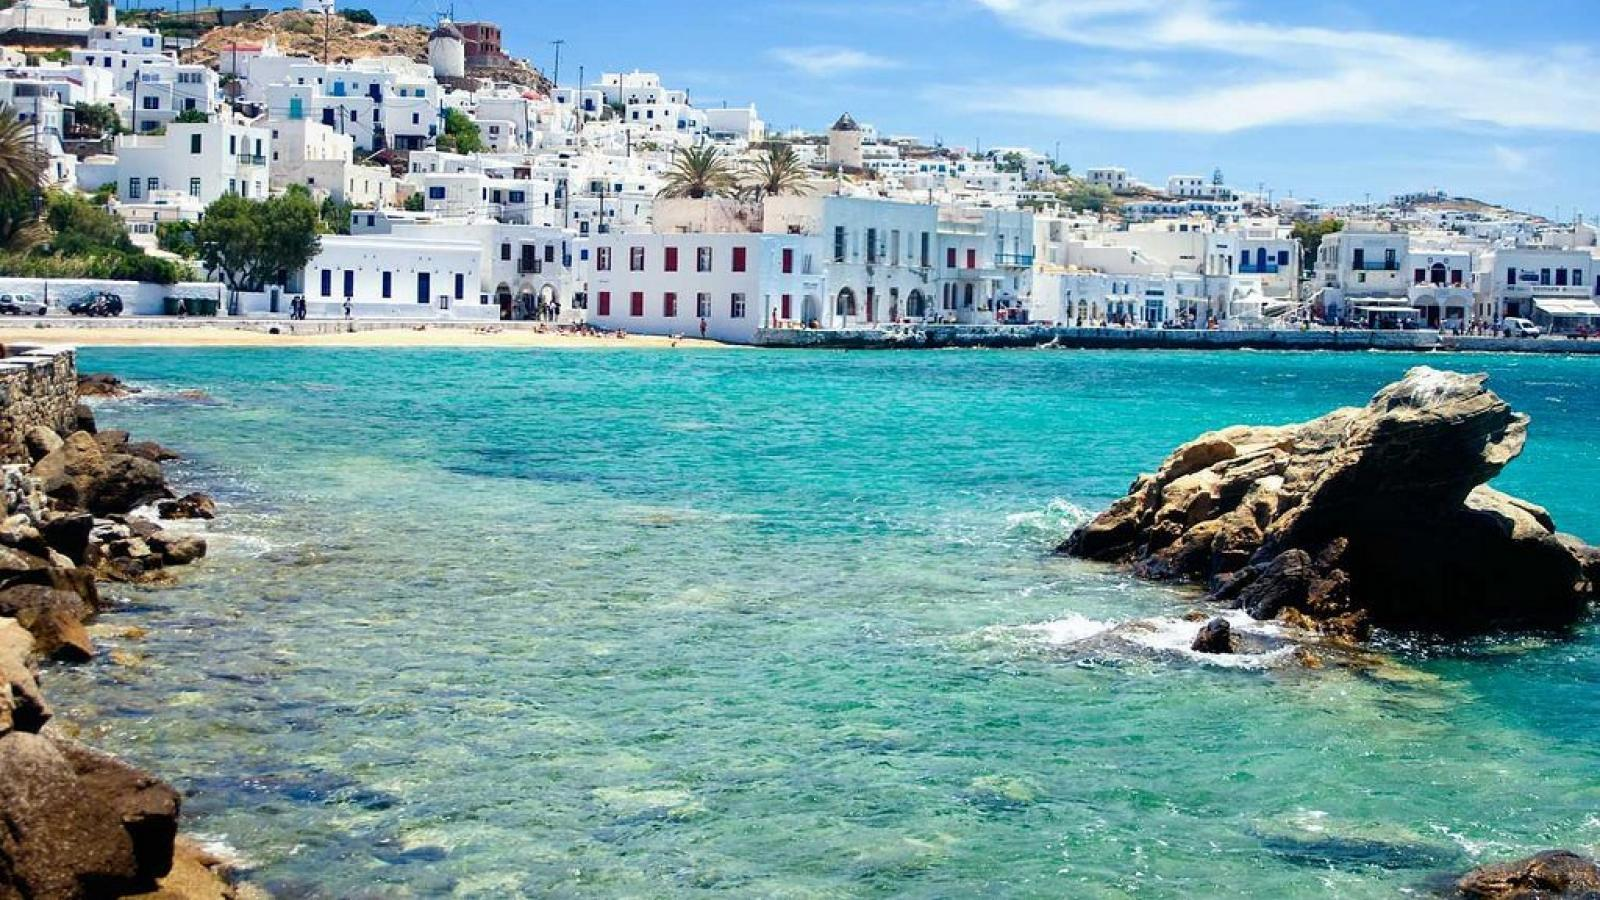 Greece includes Qatar among green list countries